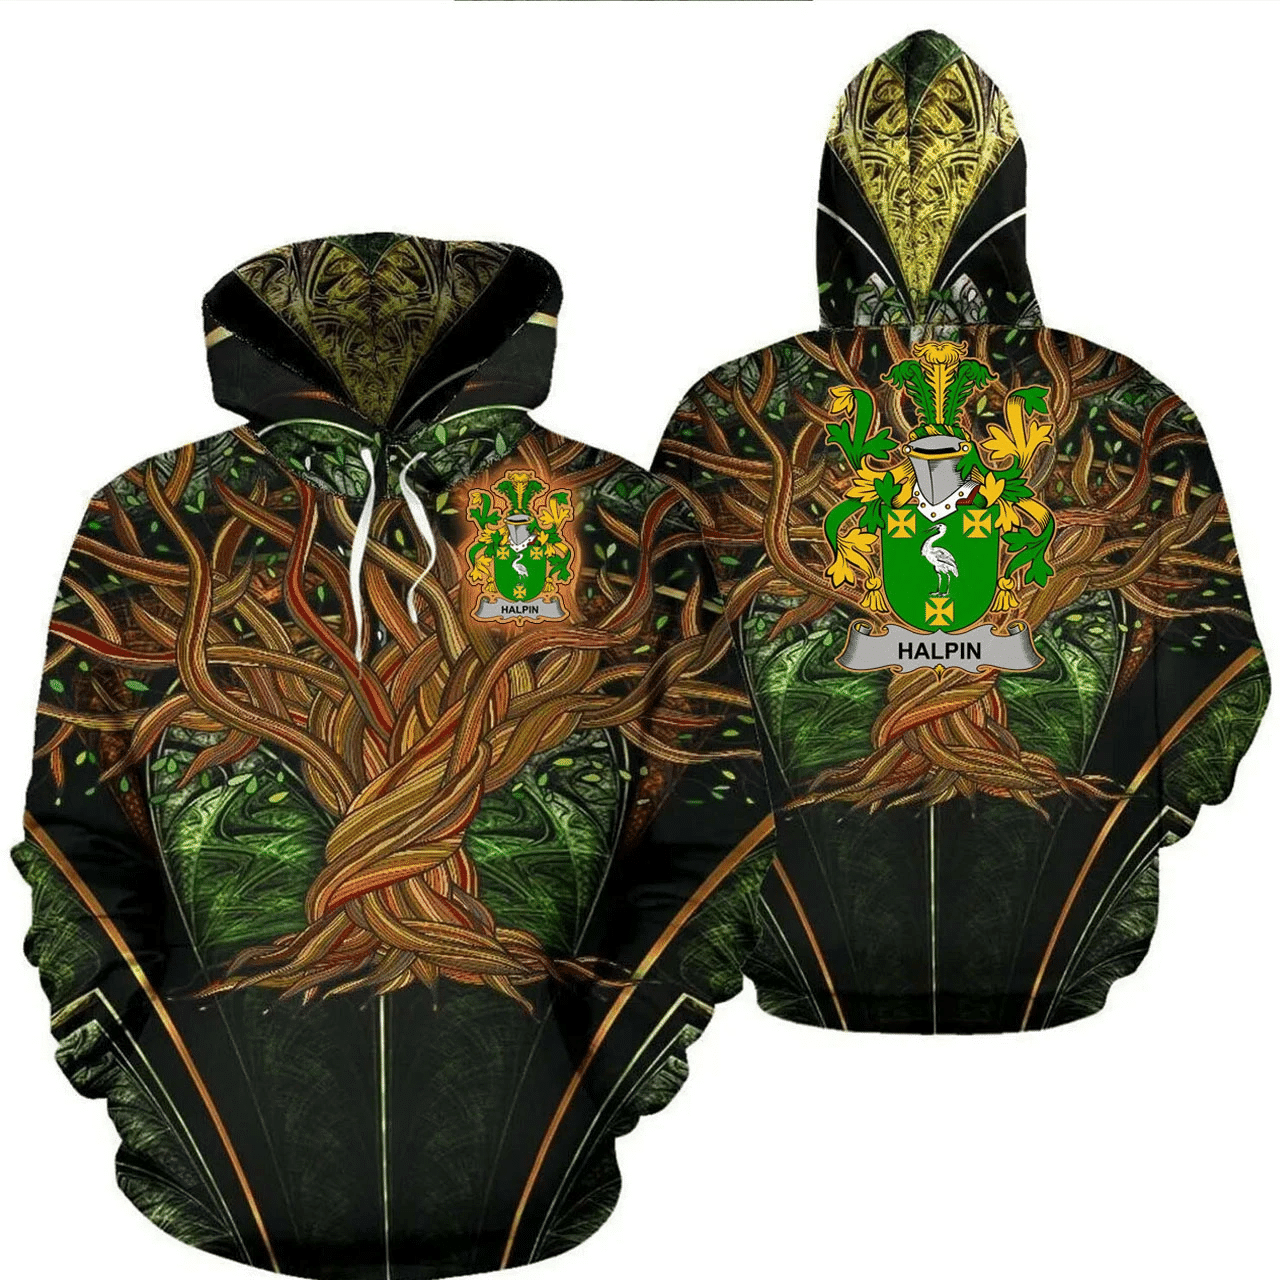 1stIreland Ireland Hoodie - Halpin or O'Halpin Irish Family Crest Hoodie - Tree Of Life A7